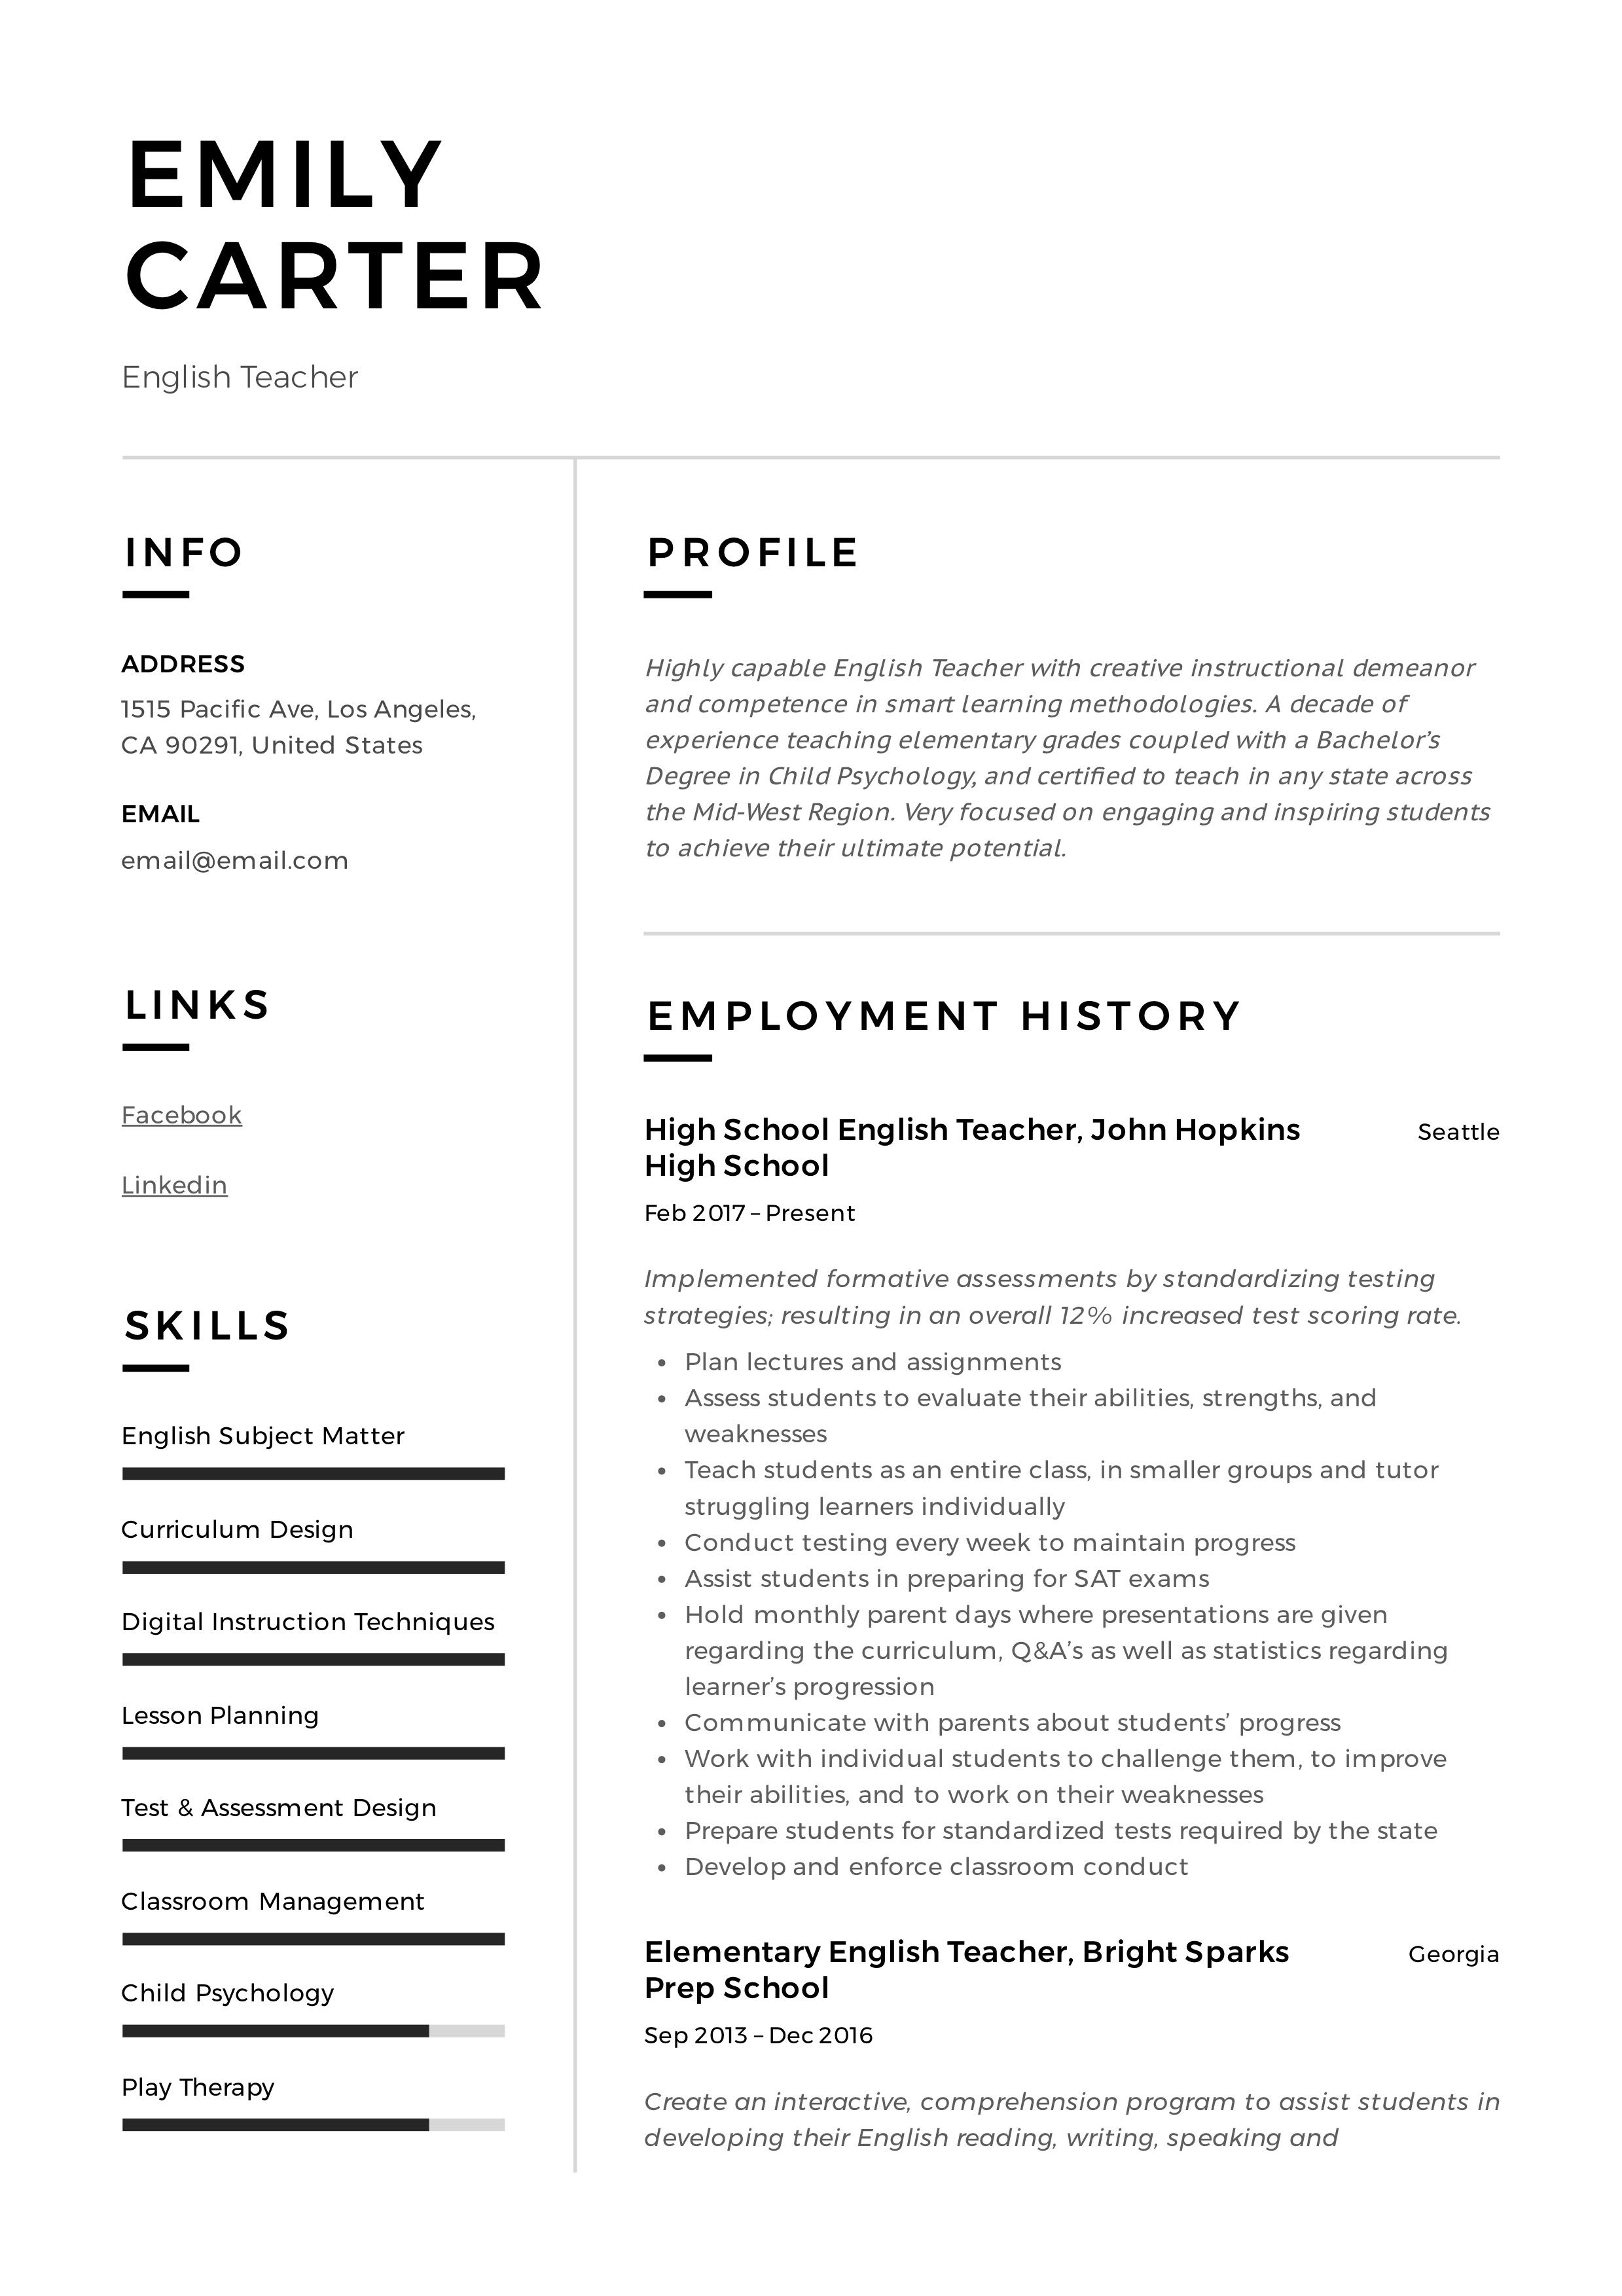 Professional English School Teacher Resume, template